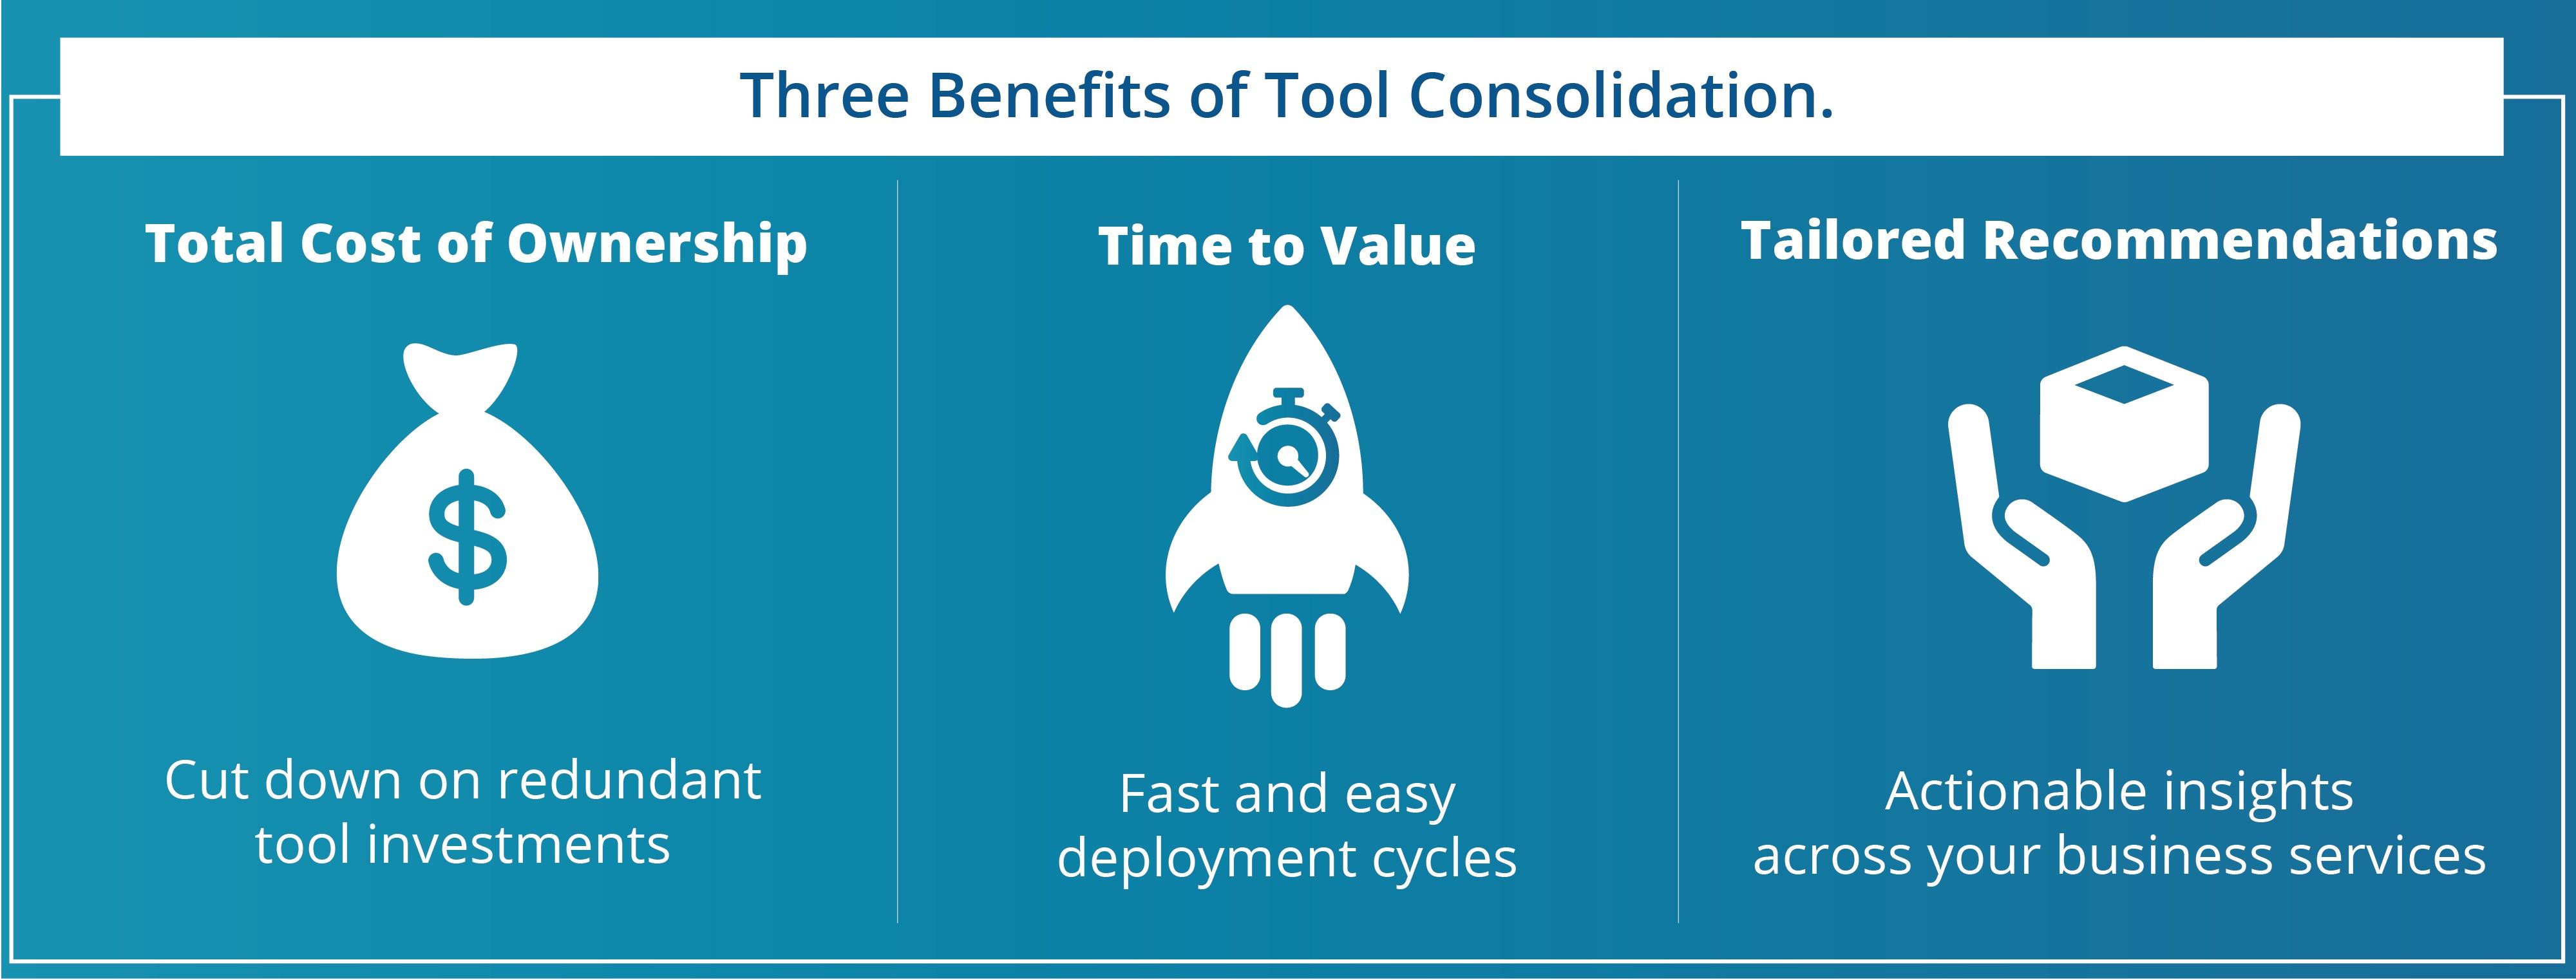 Three Benefits of Tool Consolidation